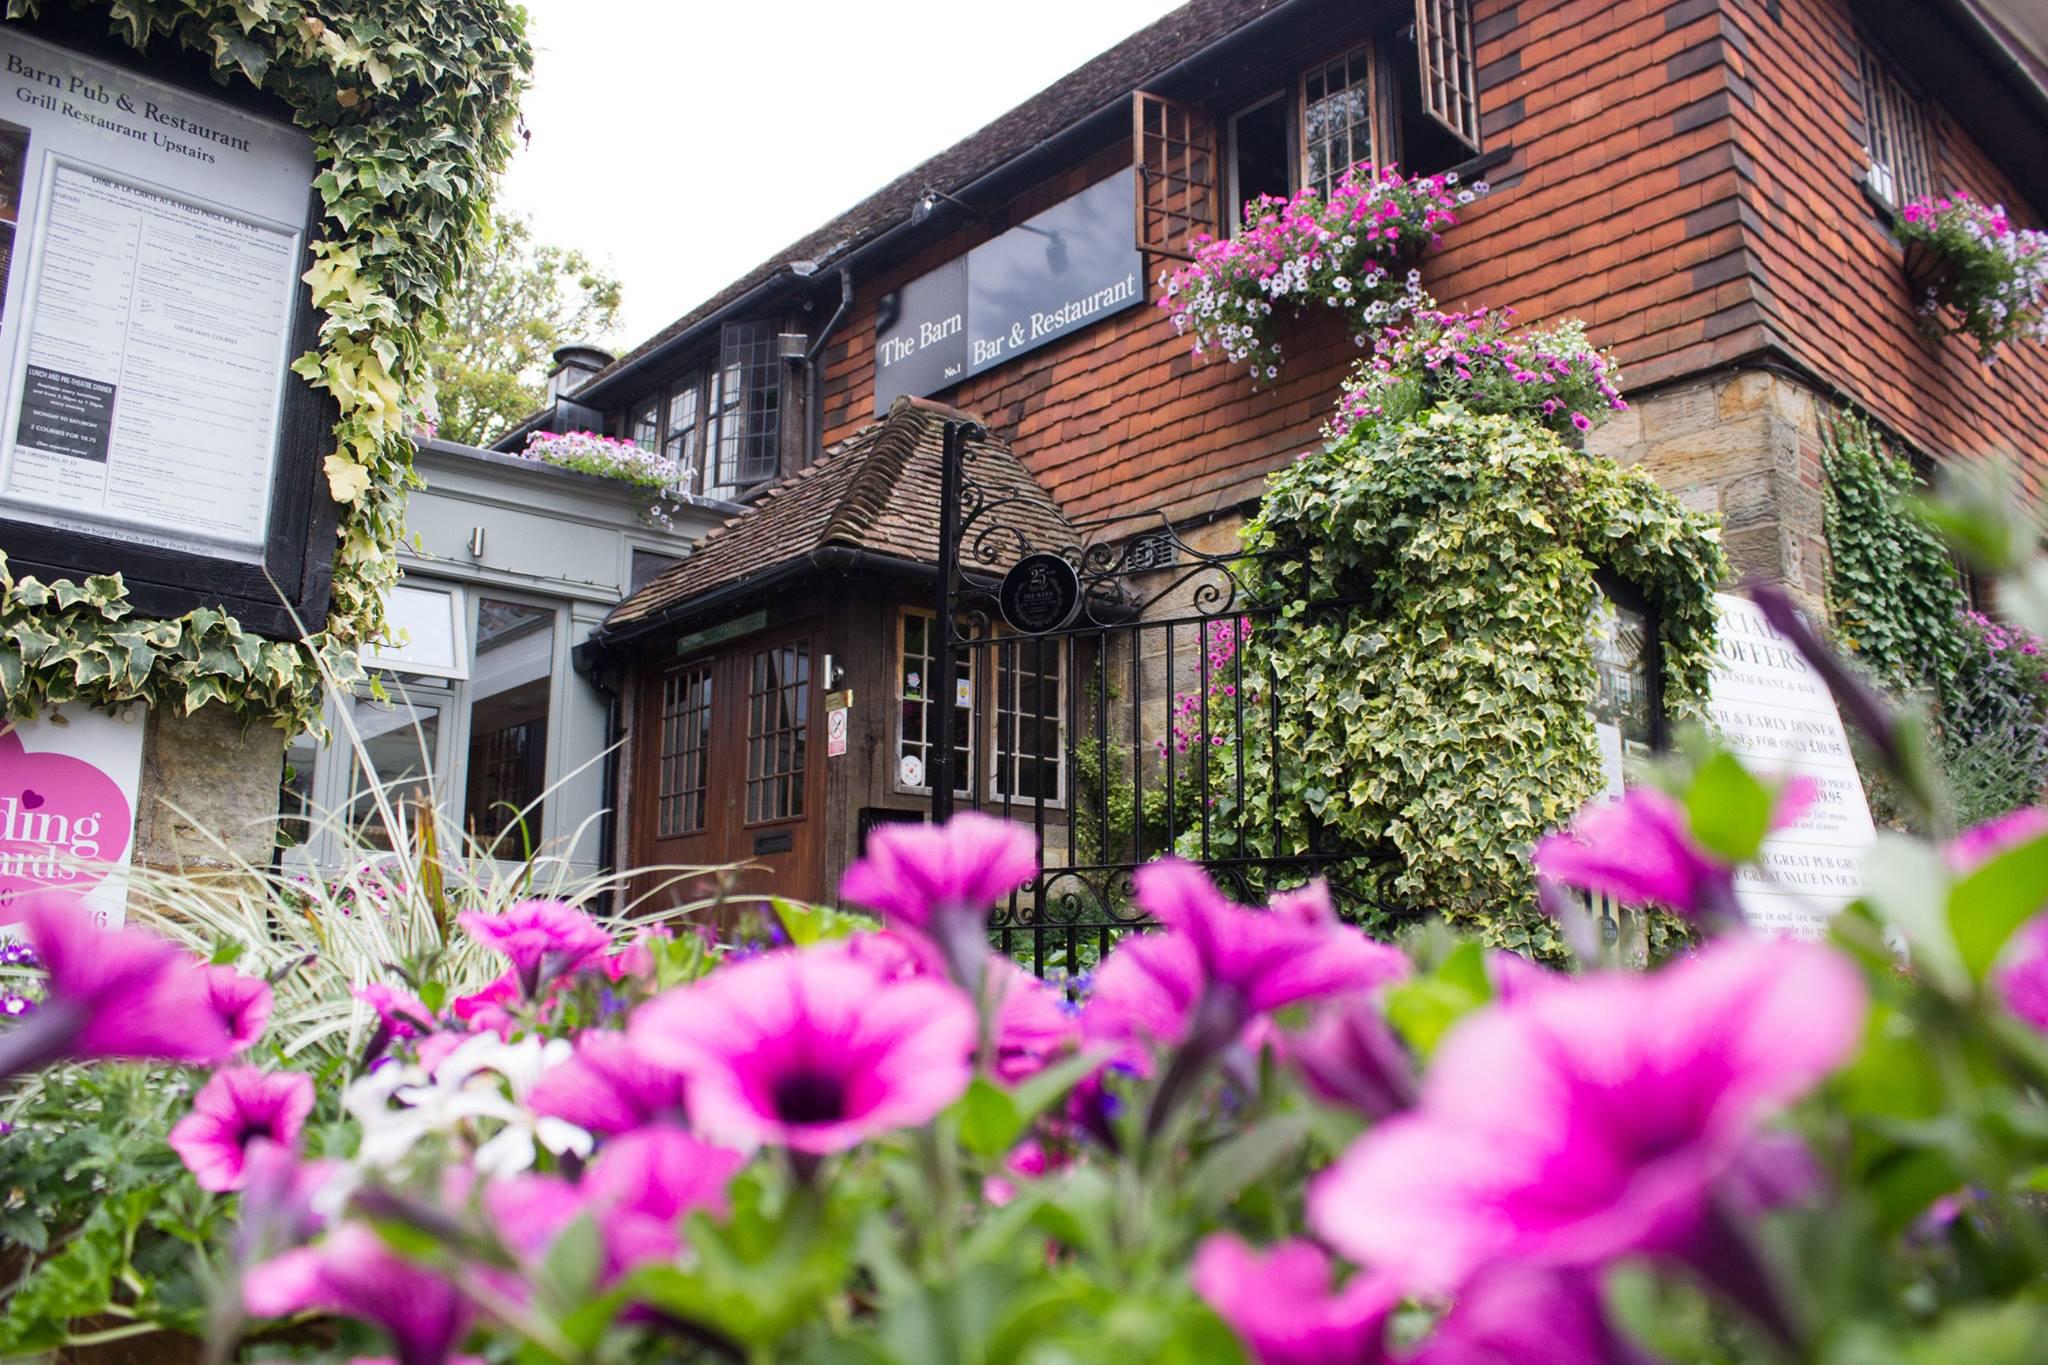 The Barn pub and restaurant, Royal Tunbridge Wells